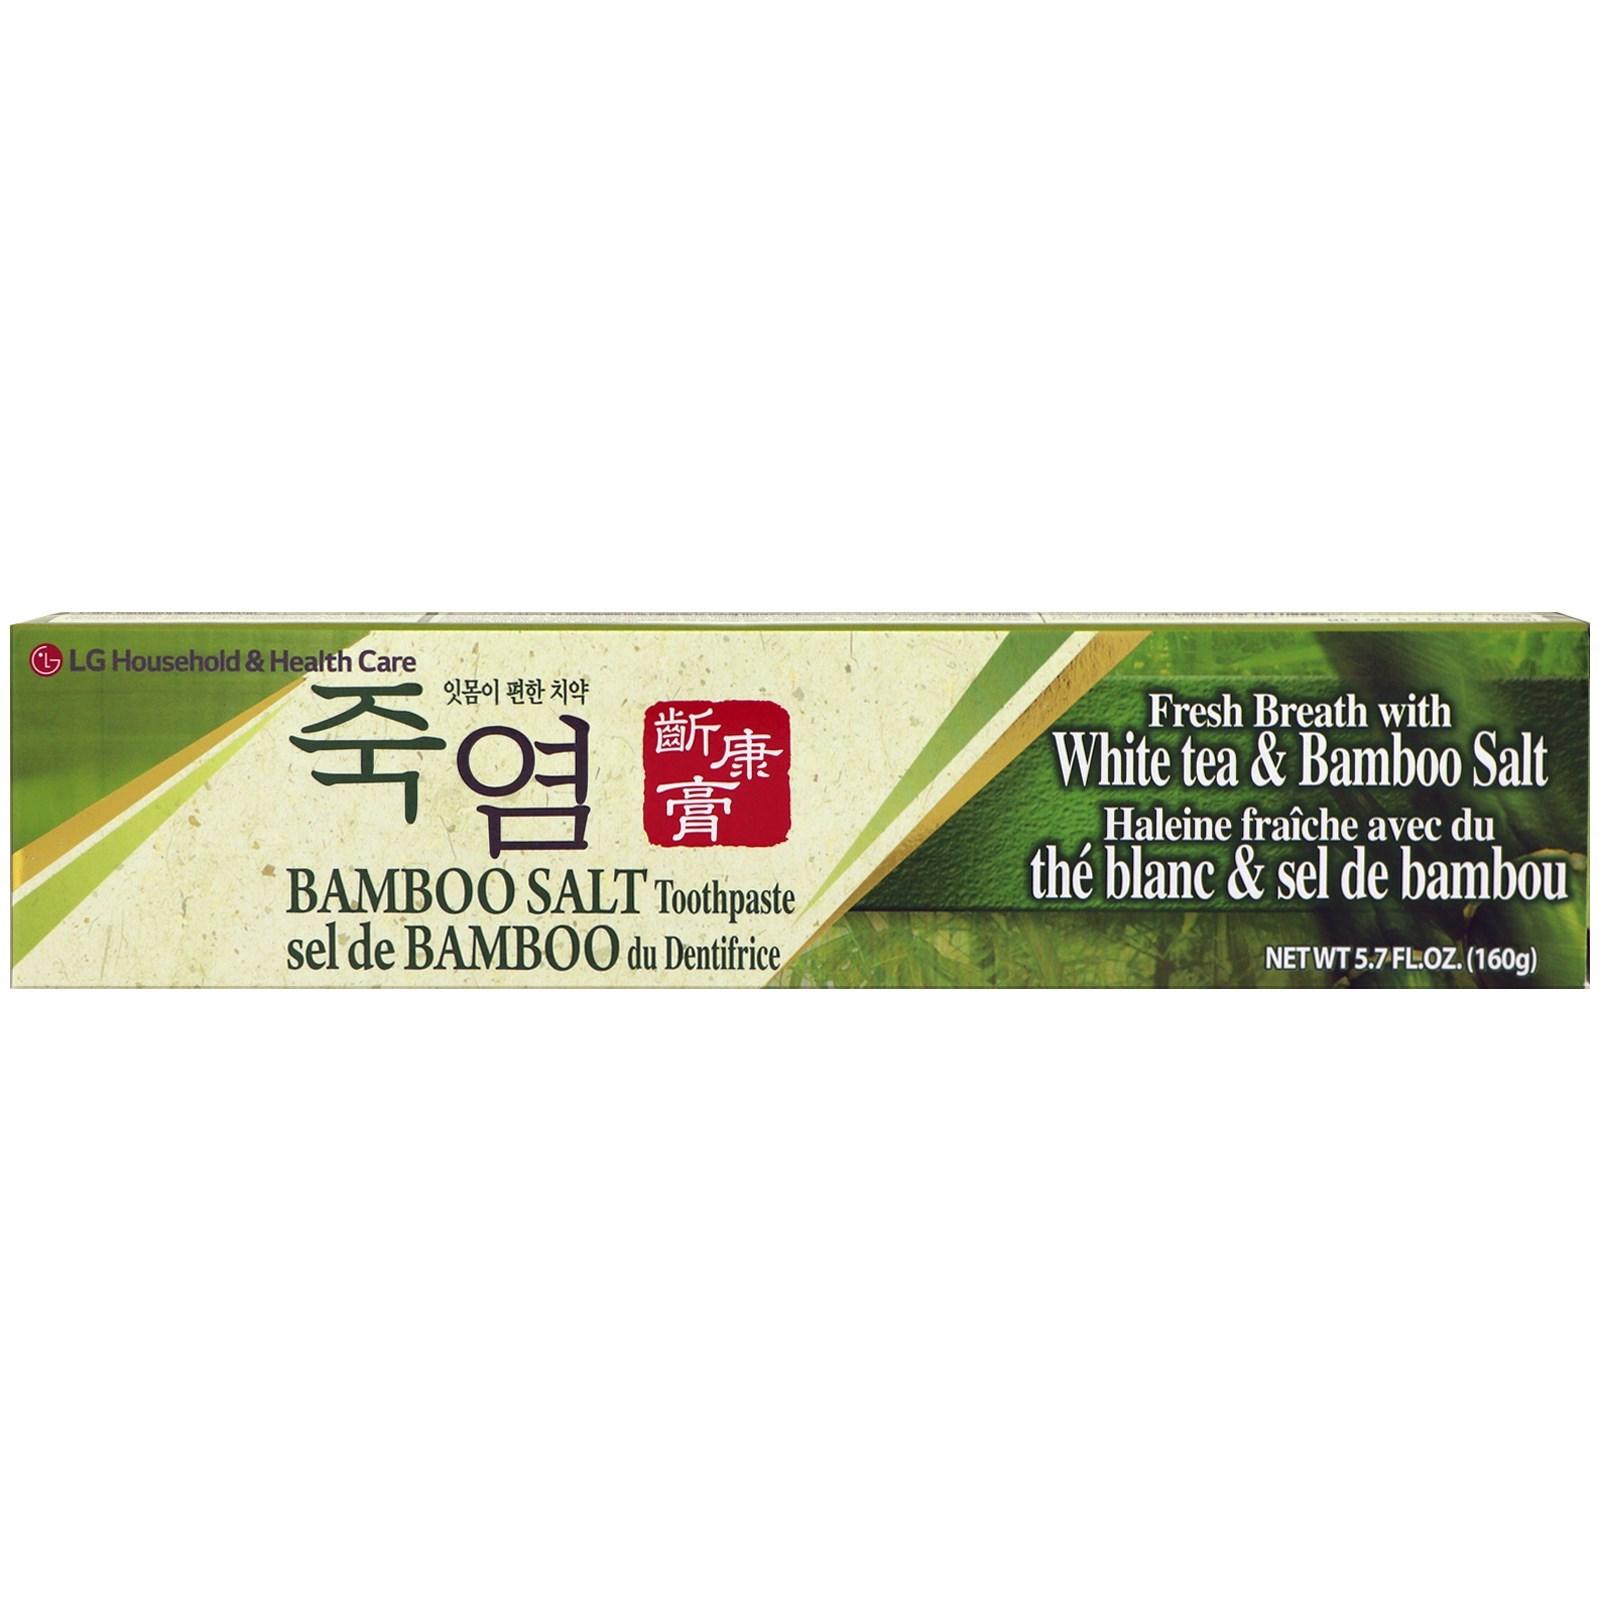 LG Household & Health Care, Bamboo Salt Toothpaste, 5.7 fl oz (160 g)